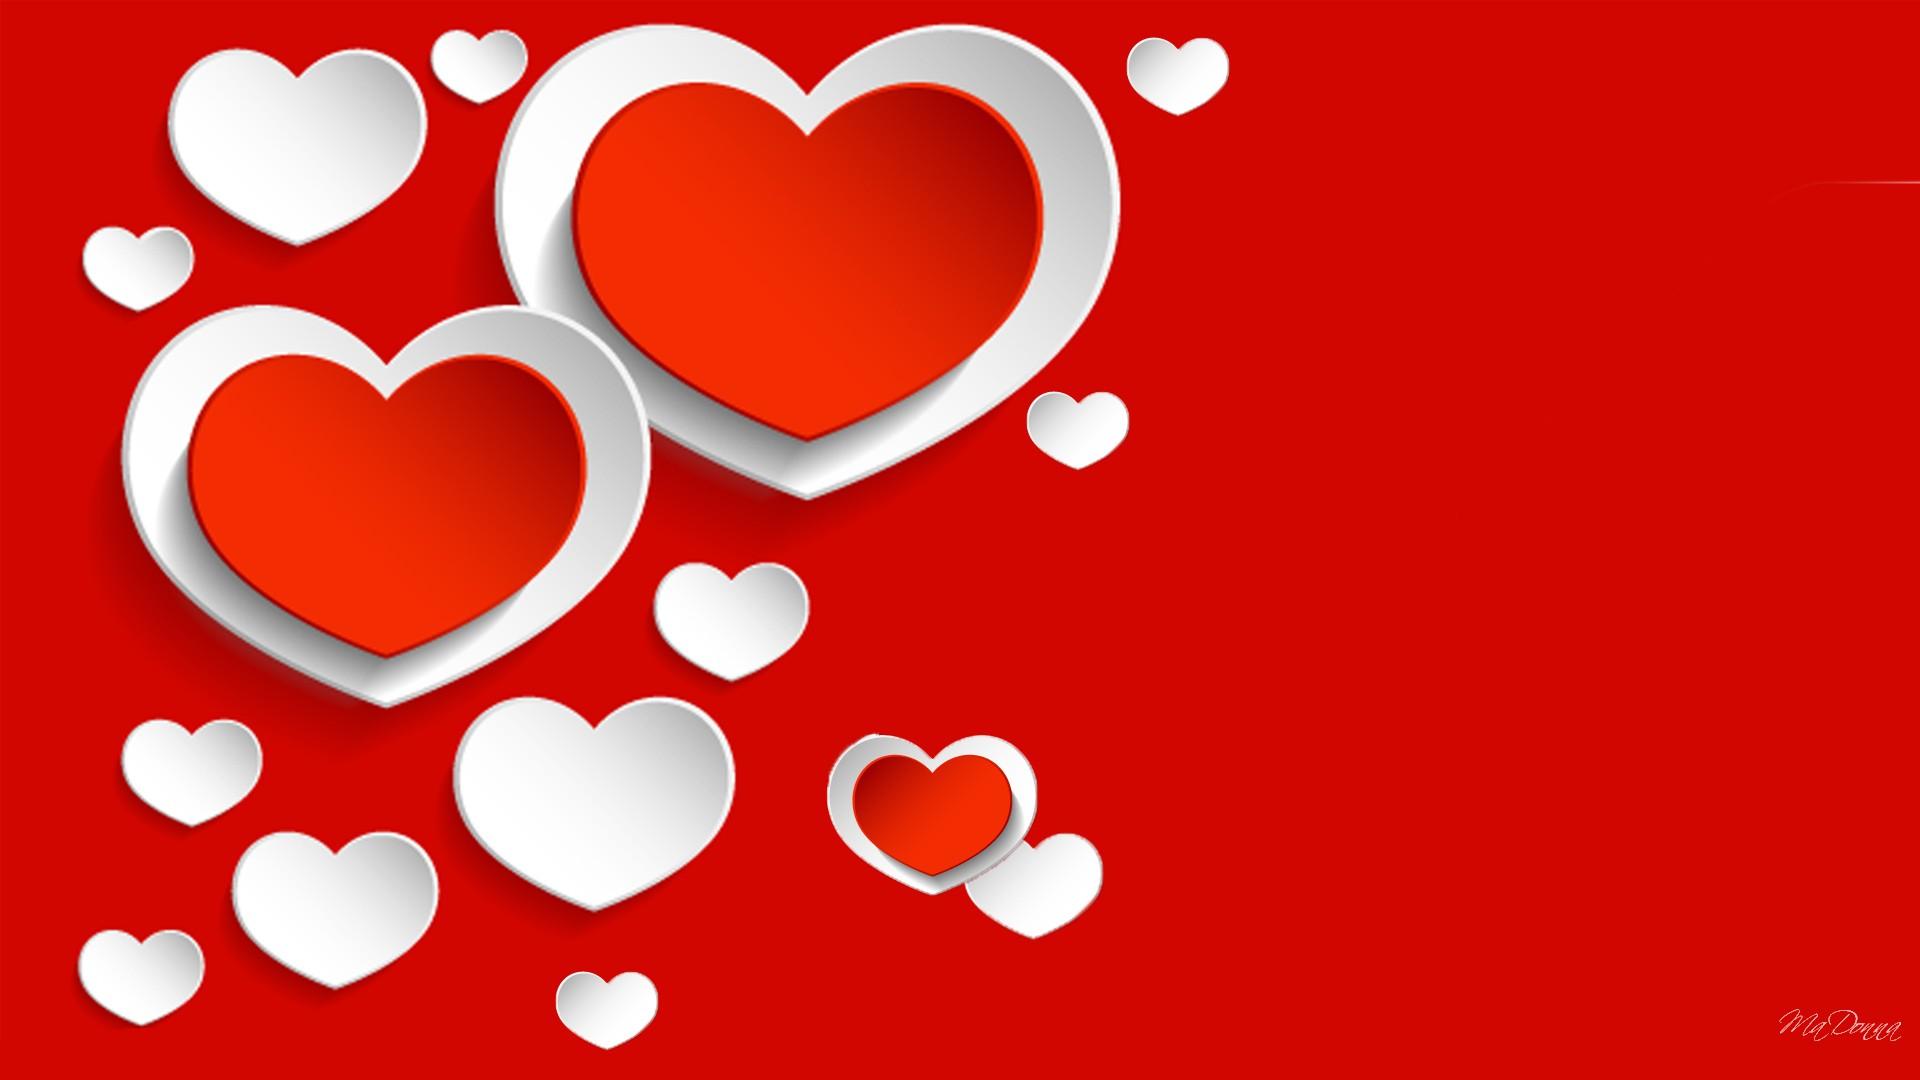 cute couples Kissing Love - Hot Girls Wallpaper